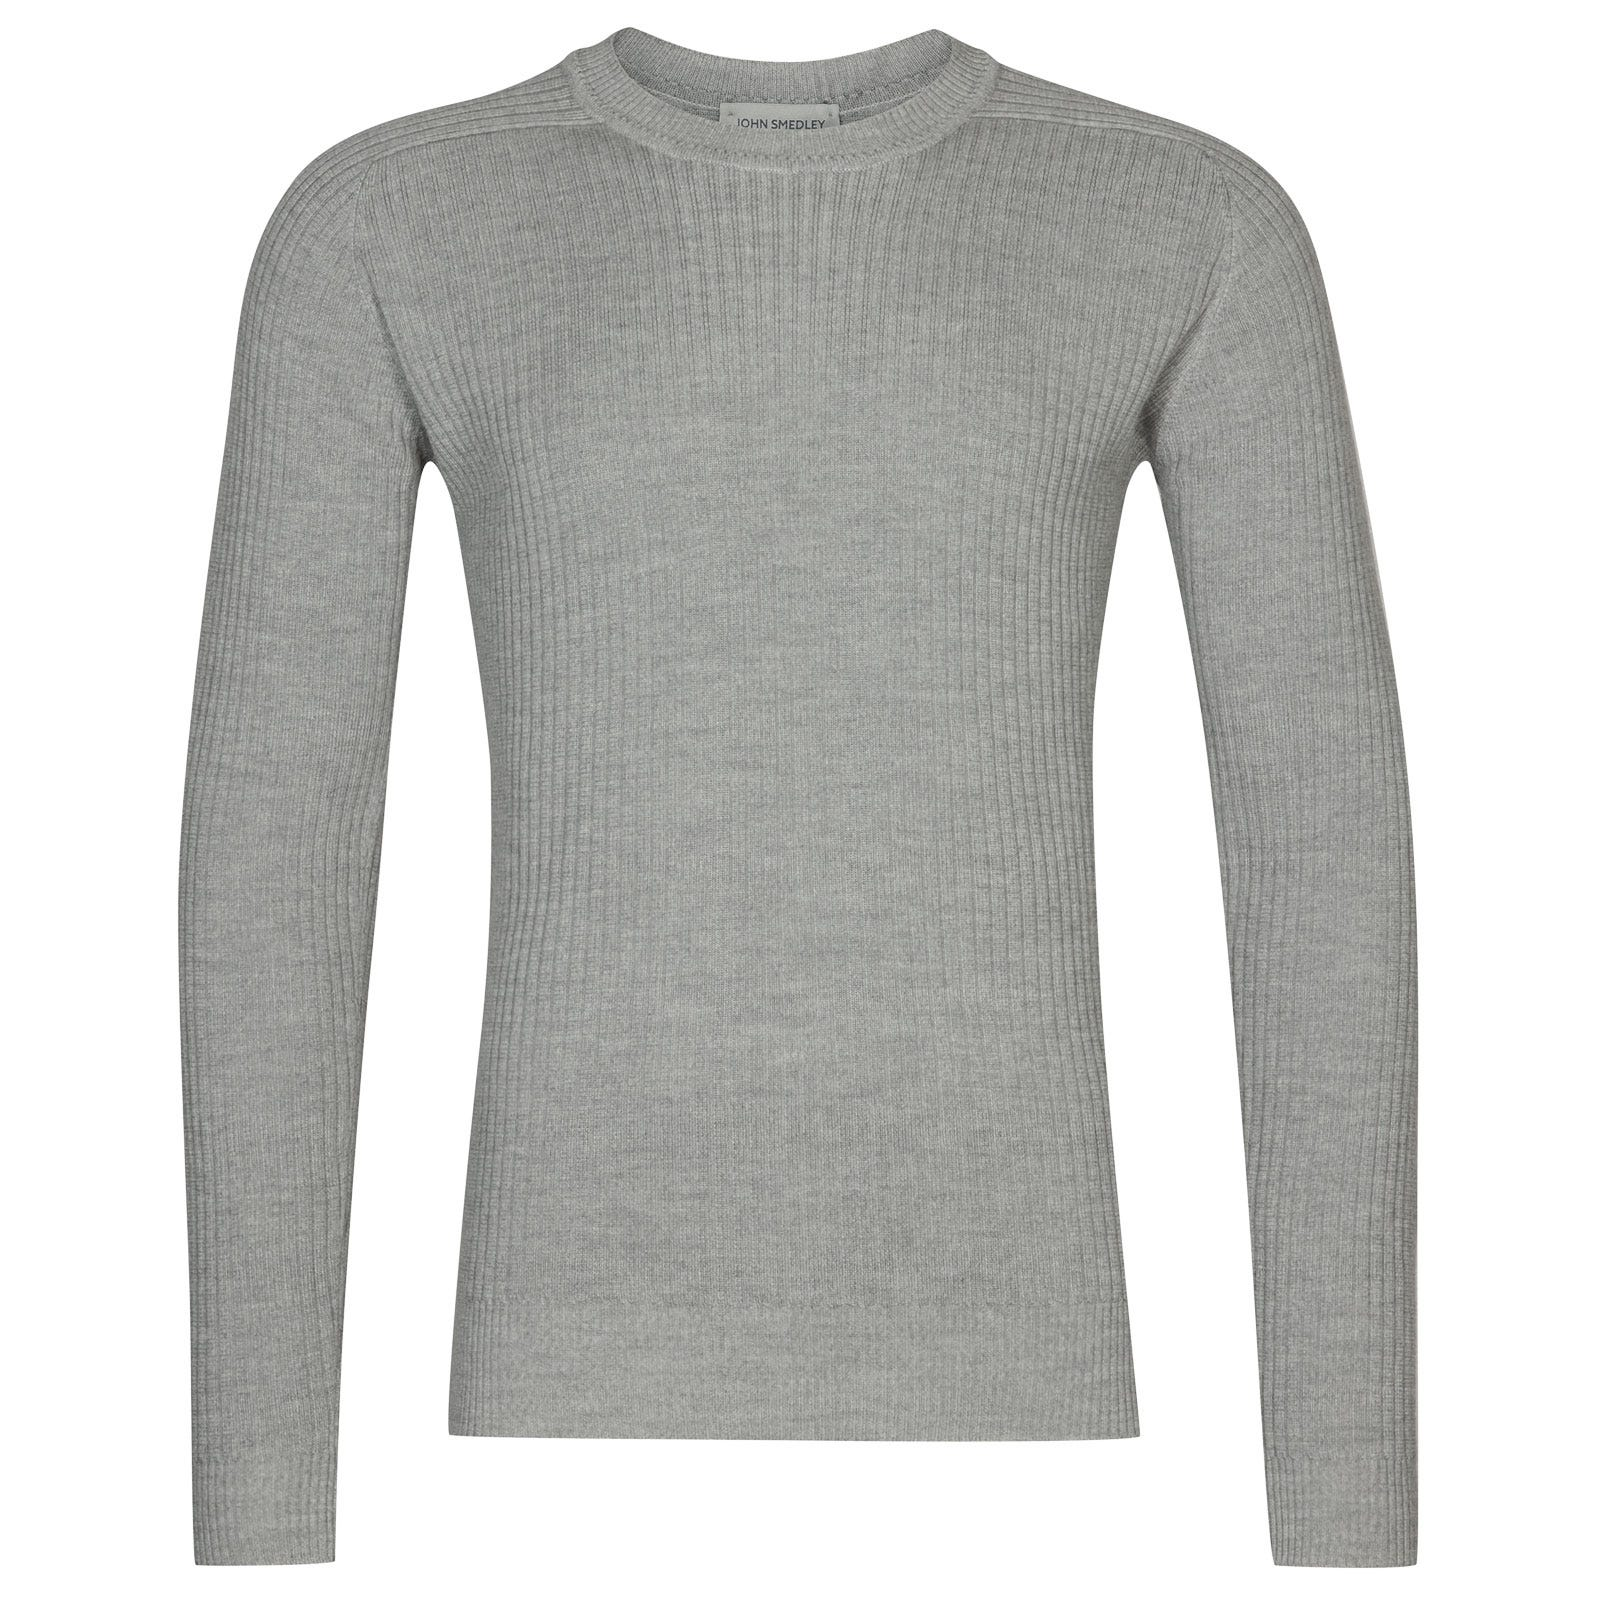 John Smedley idris Merino Wool Pullover in Bardot Grey-M